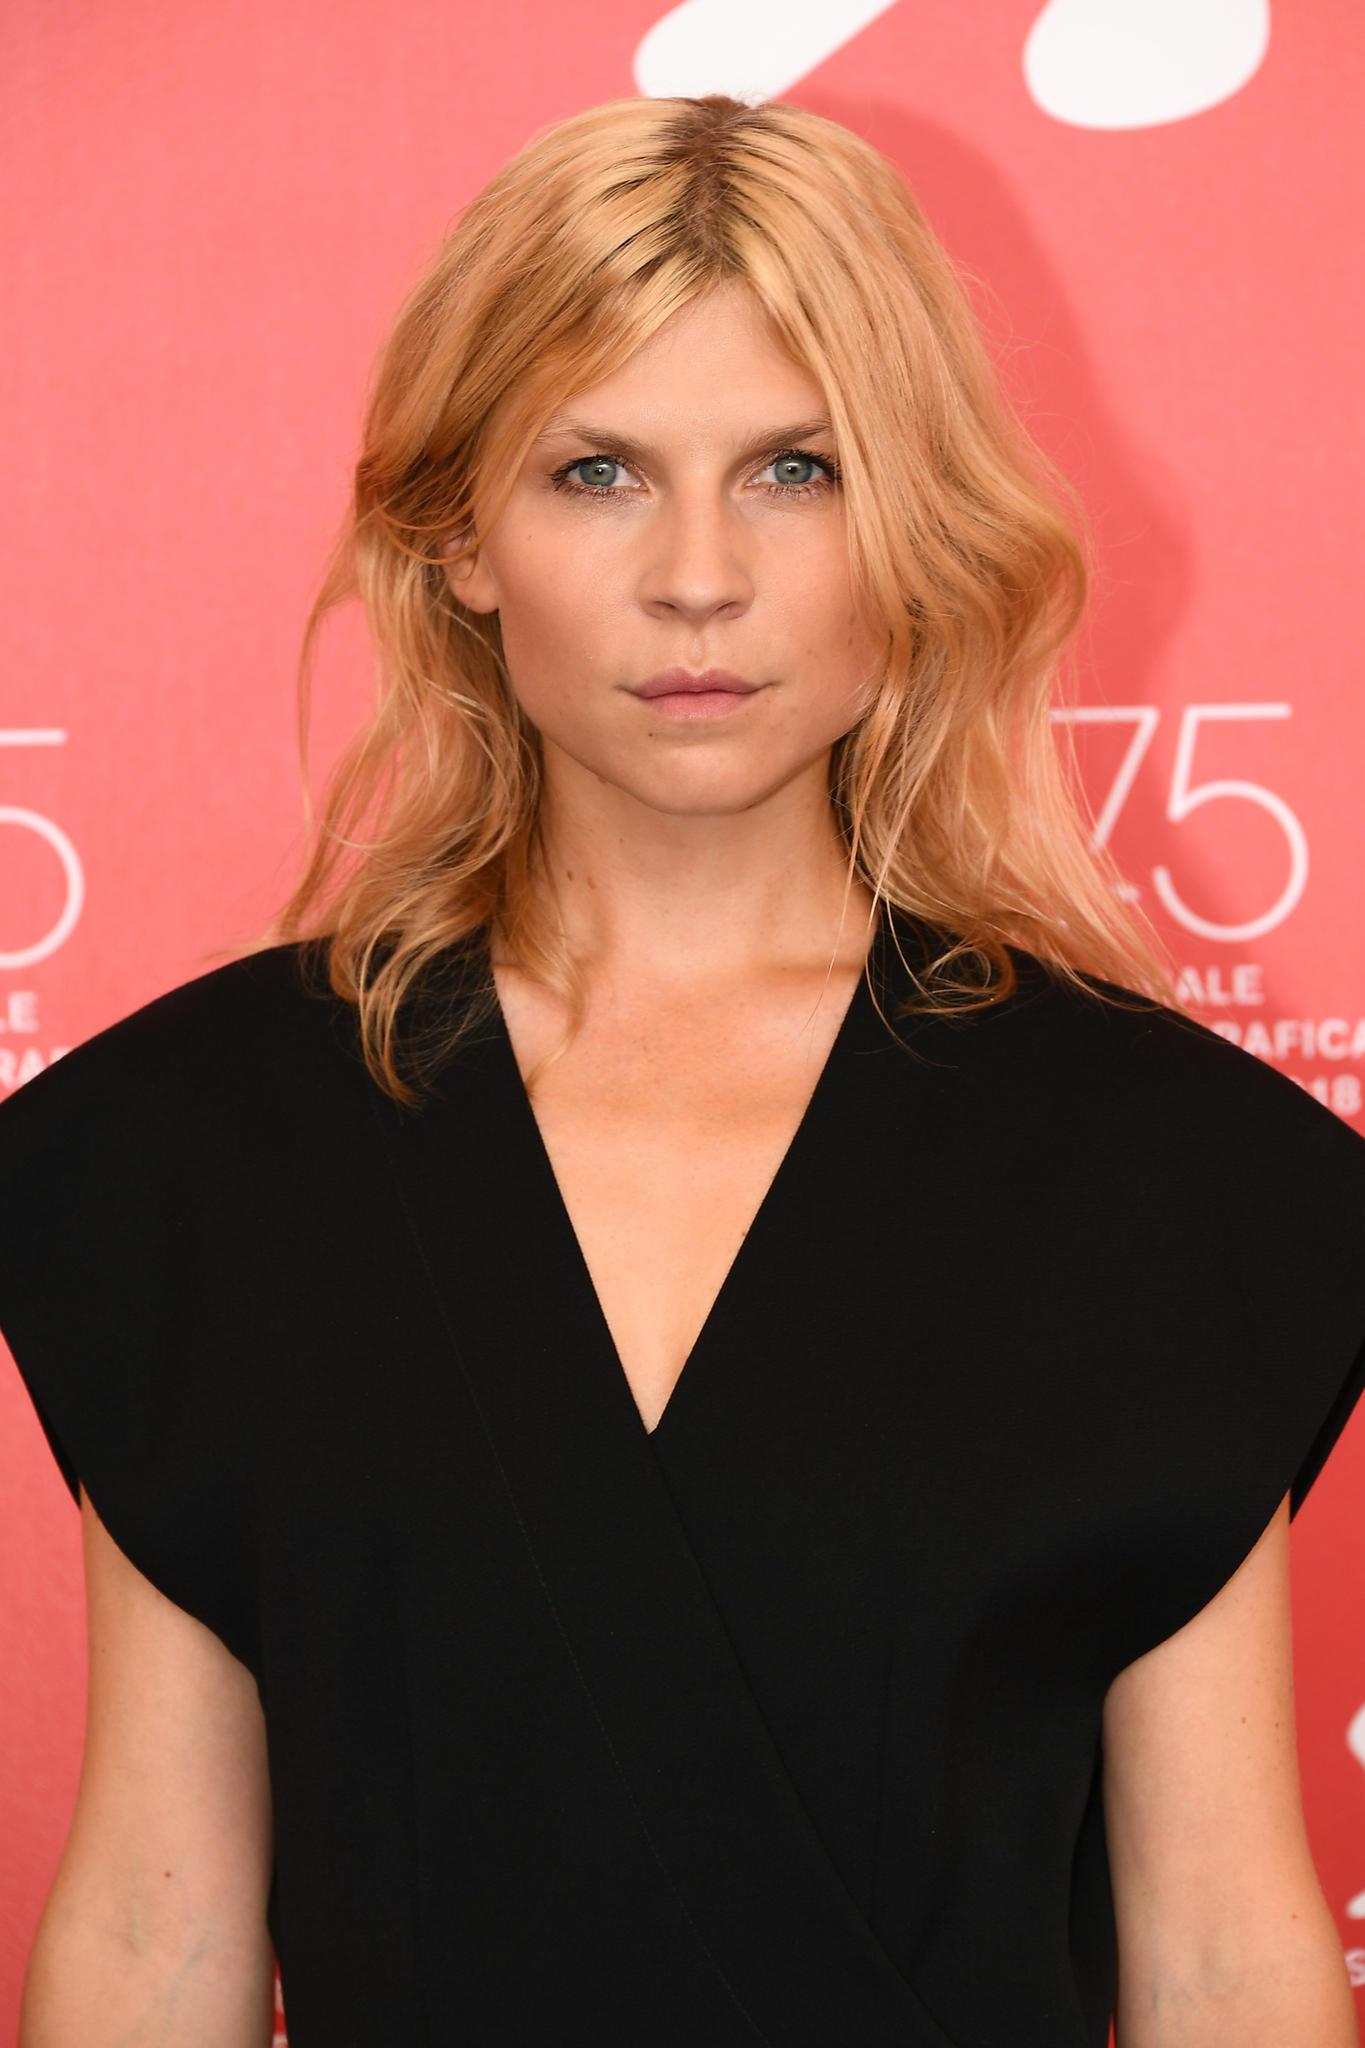 SchauspielerinClémence Poésy trägt French Cut